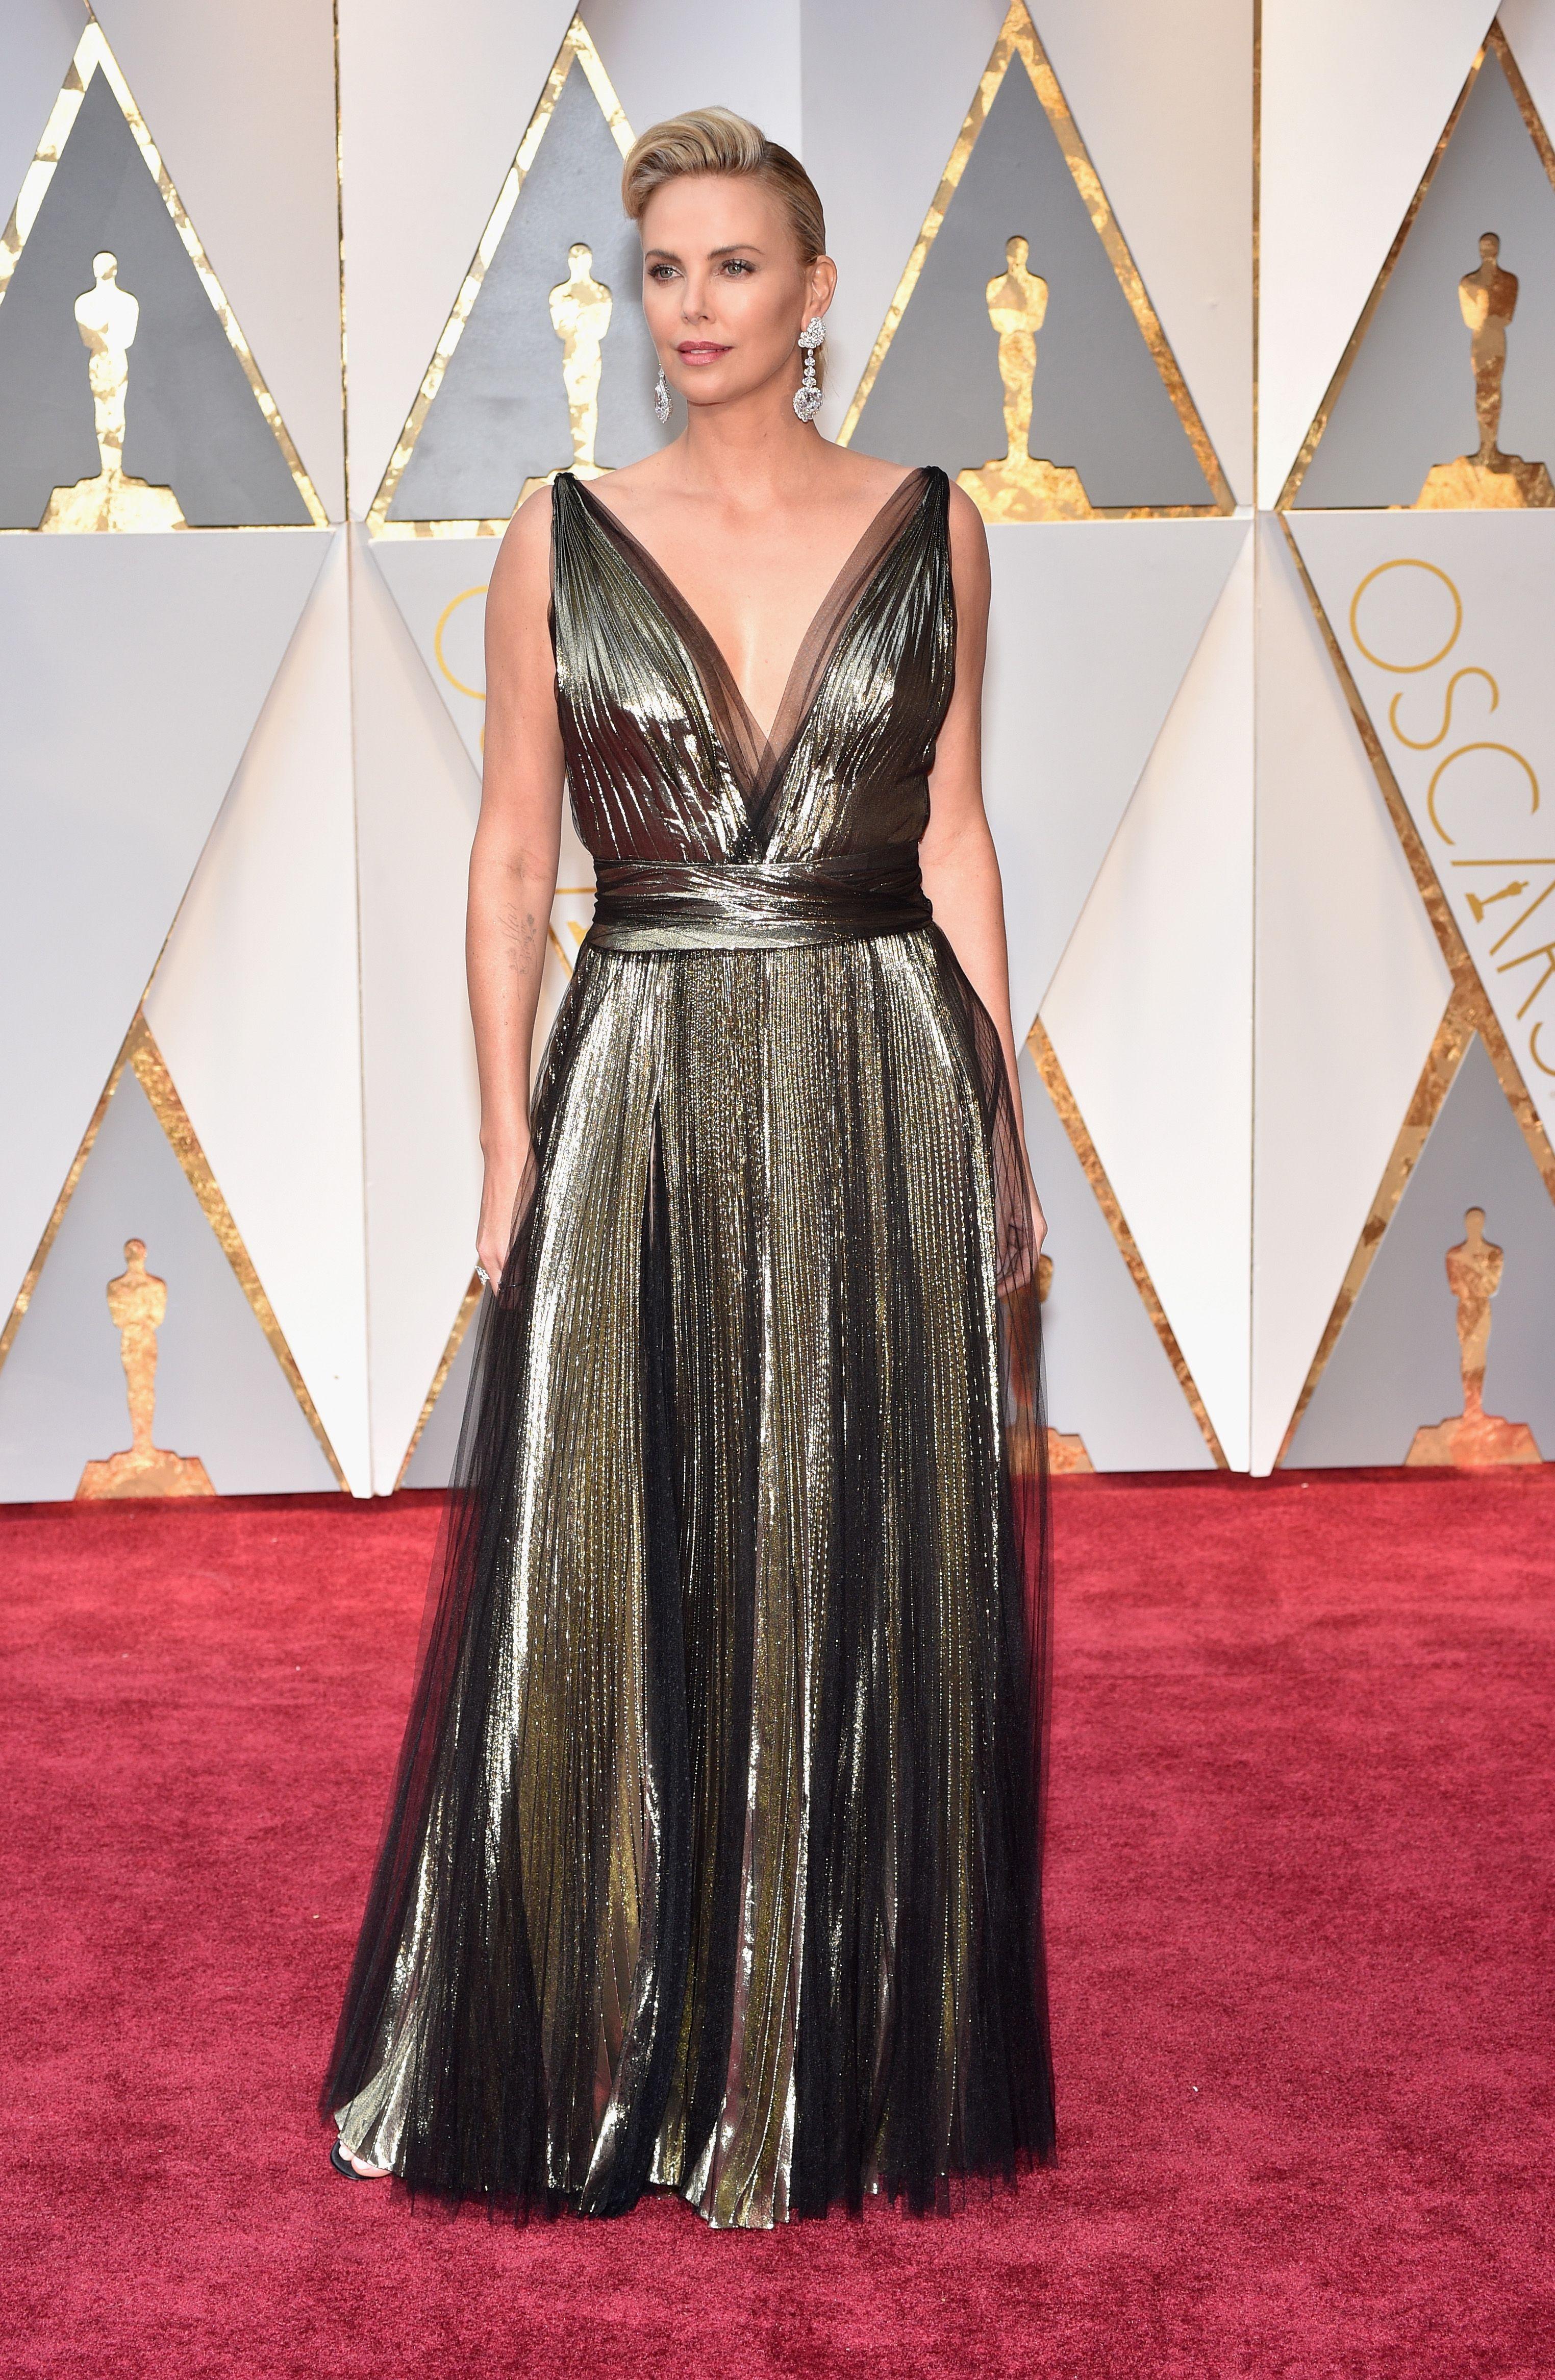 Charlize Theron Dress on Oscar